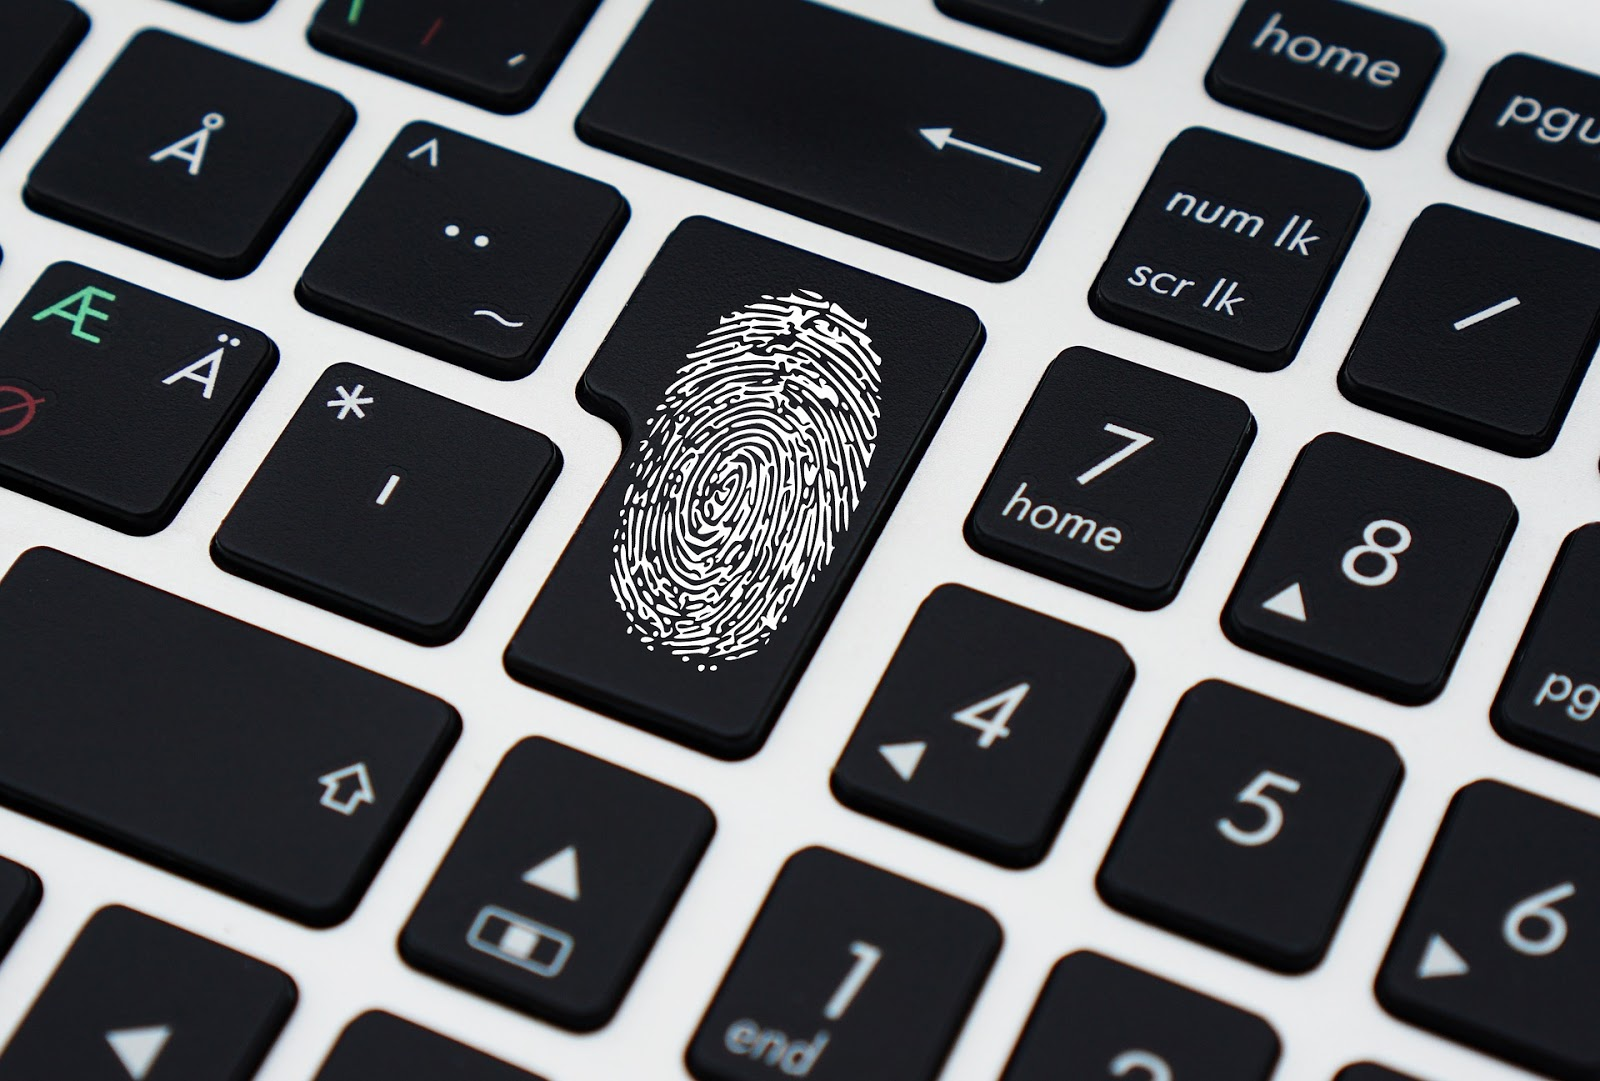 3 Percent Of Us Are Still Using Bad Passwords